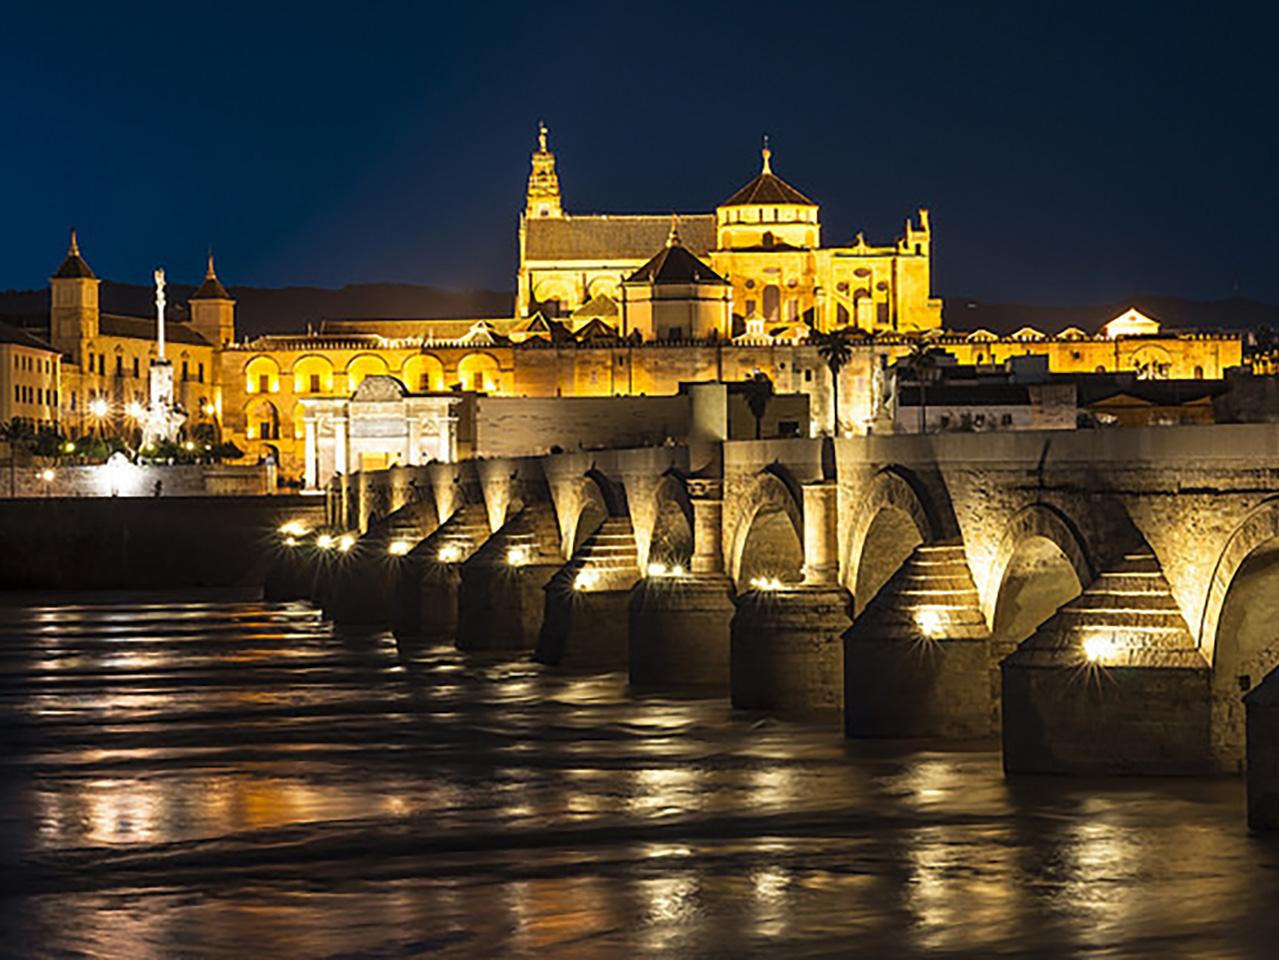 Veinte siglos de literatura de la Córdoba española